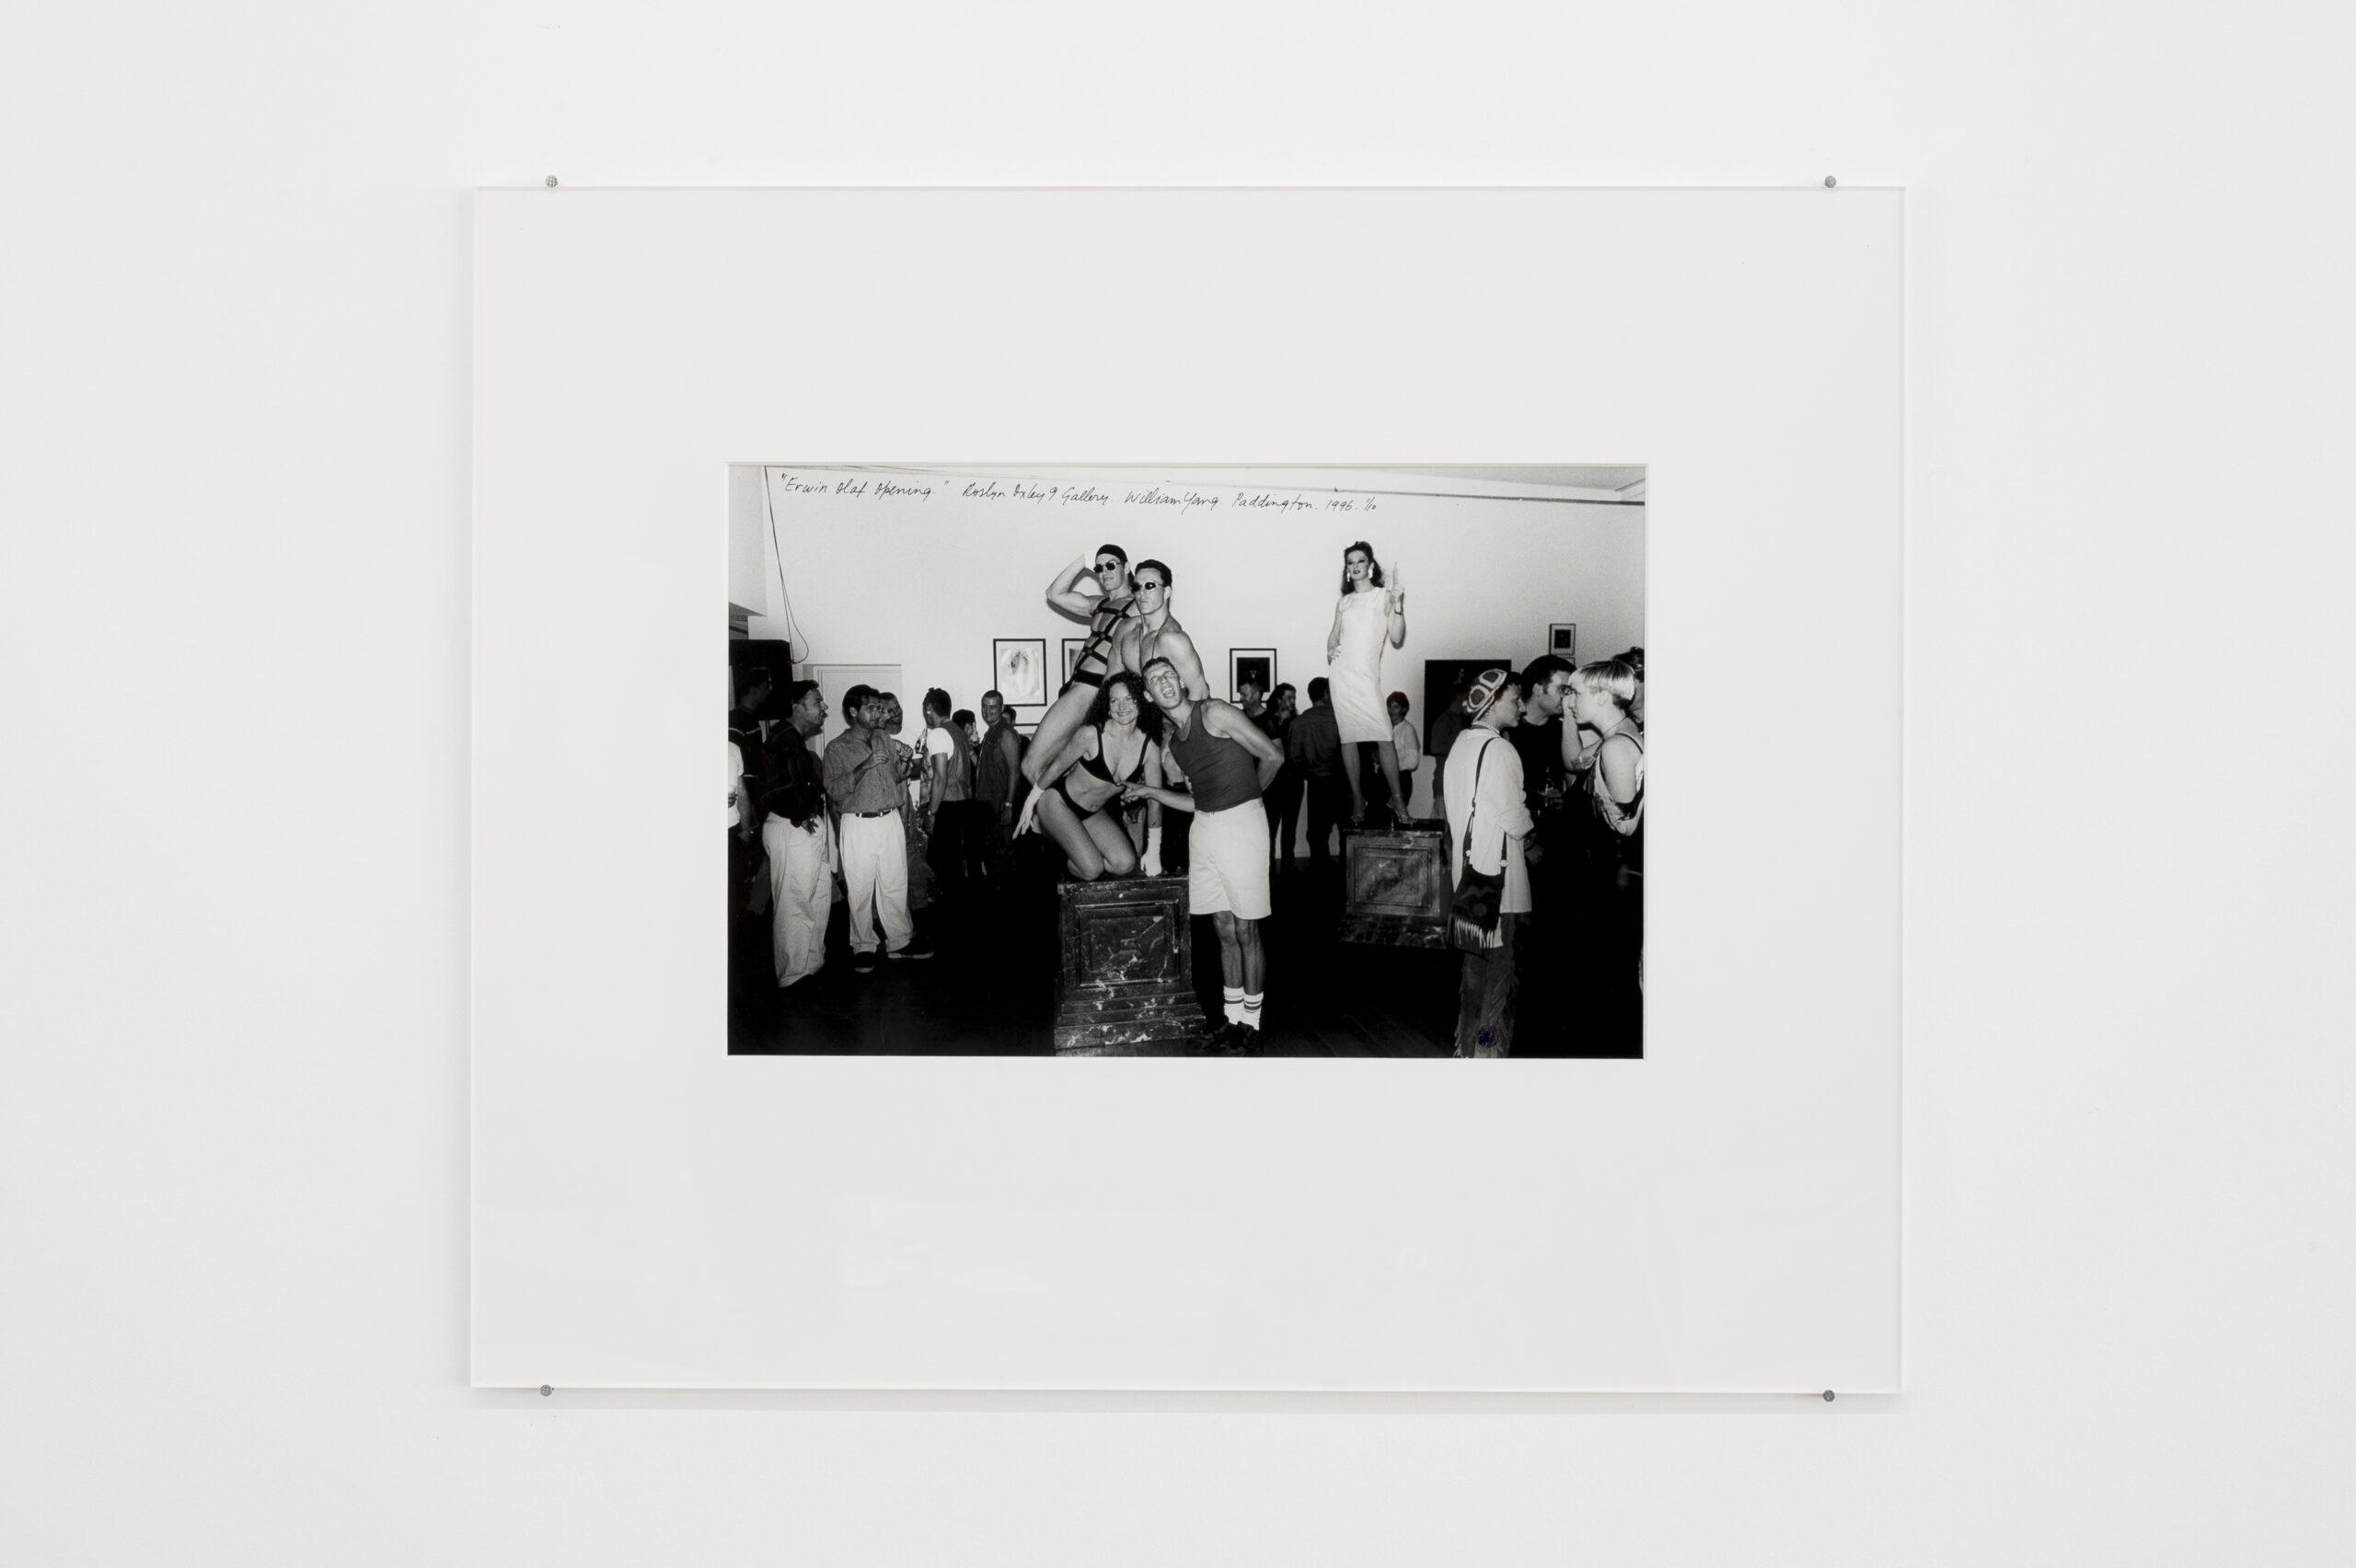 """Erwin Olaf Opening"" Roslyn Oxley 9 Gallery"